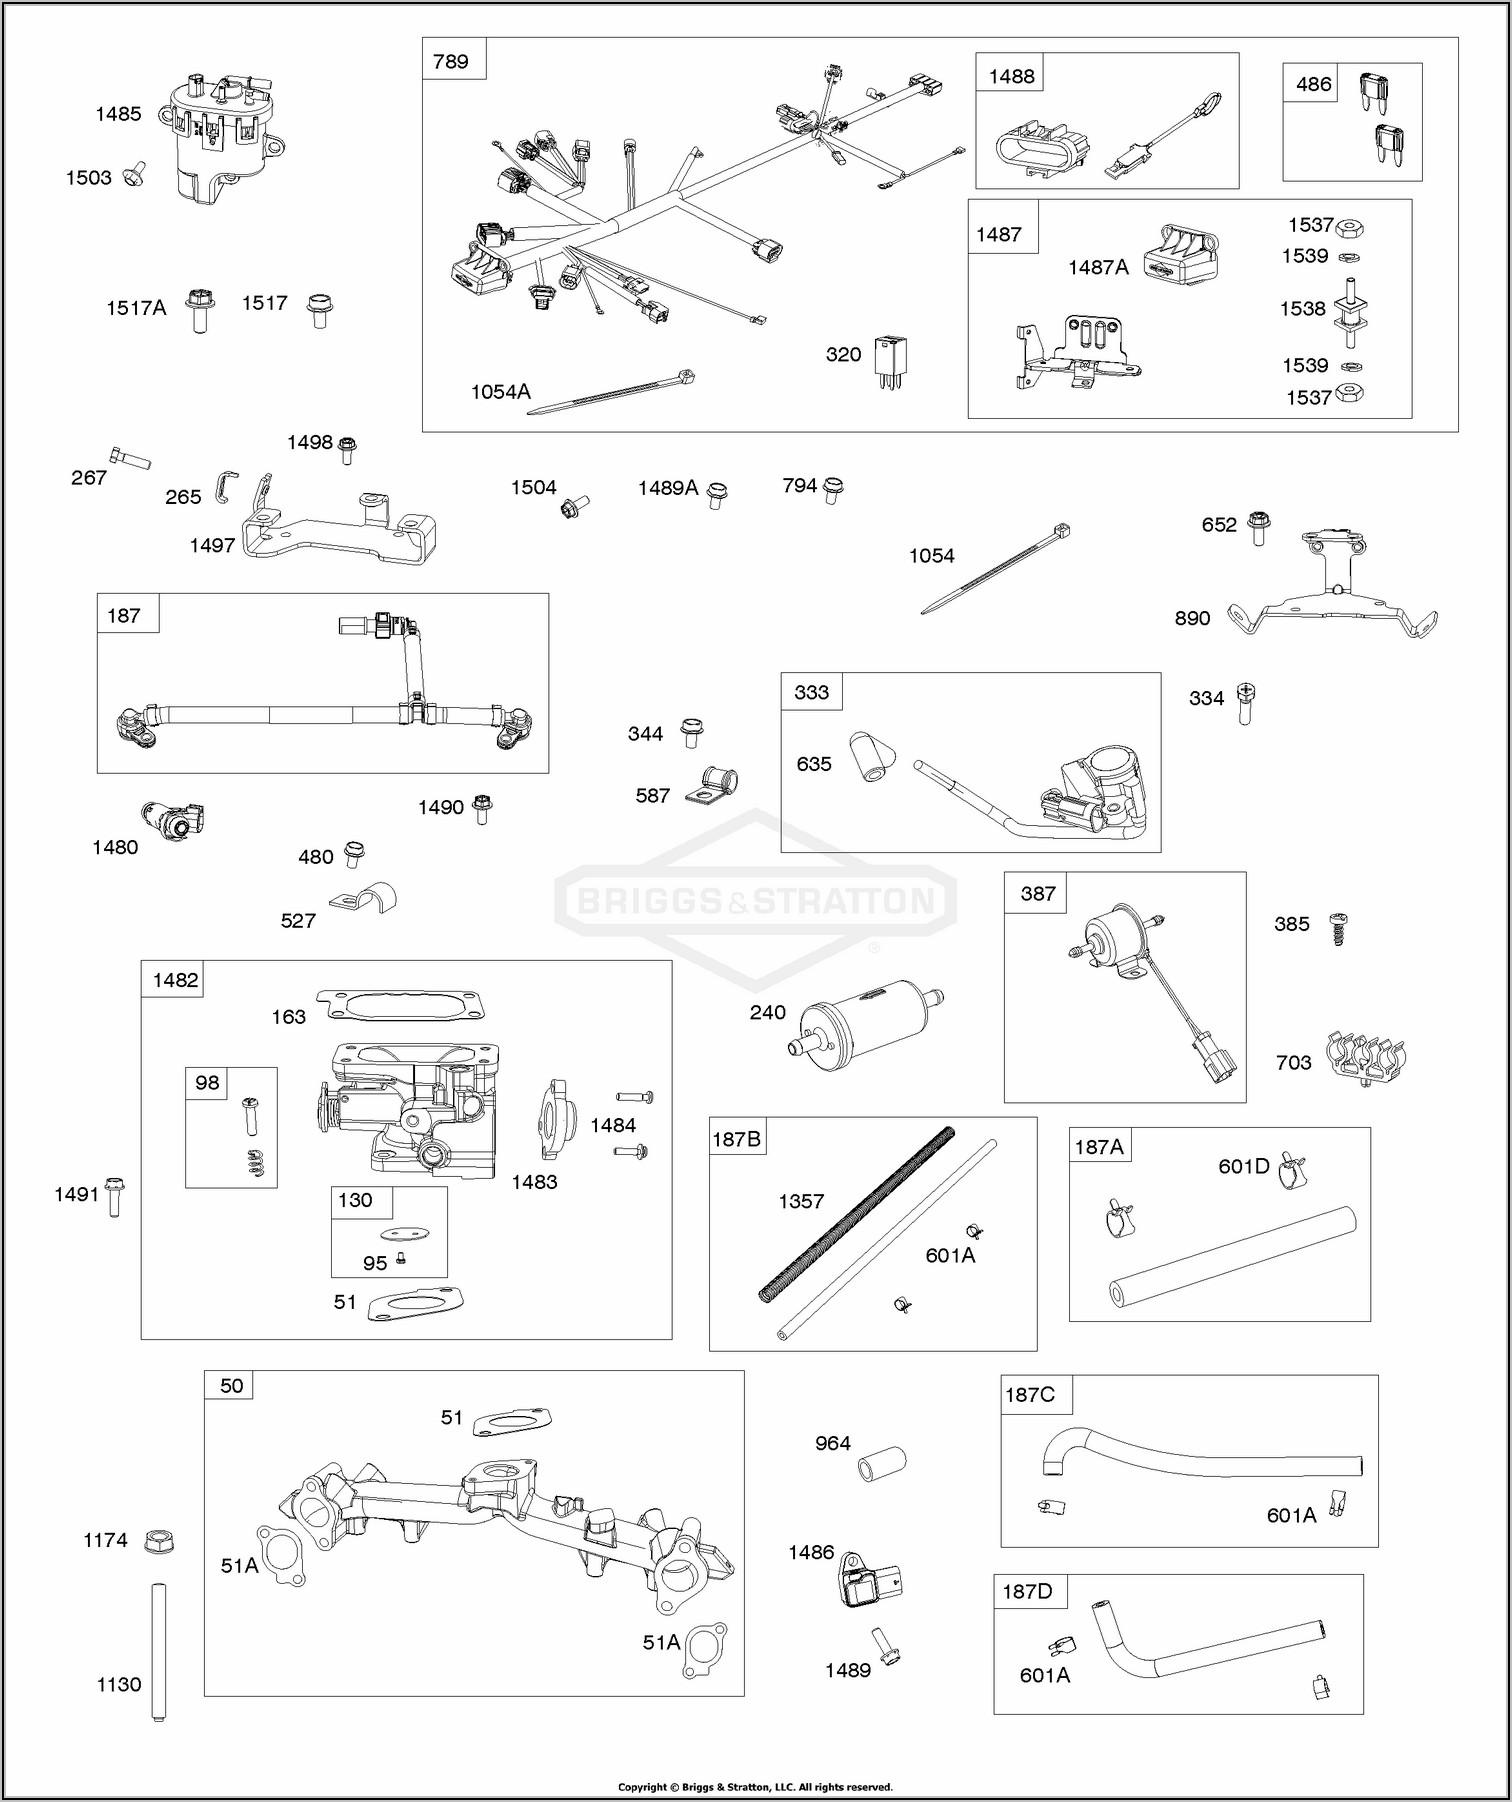 Briggs And Stratton Pressure Washer Throttle Spring Diagram